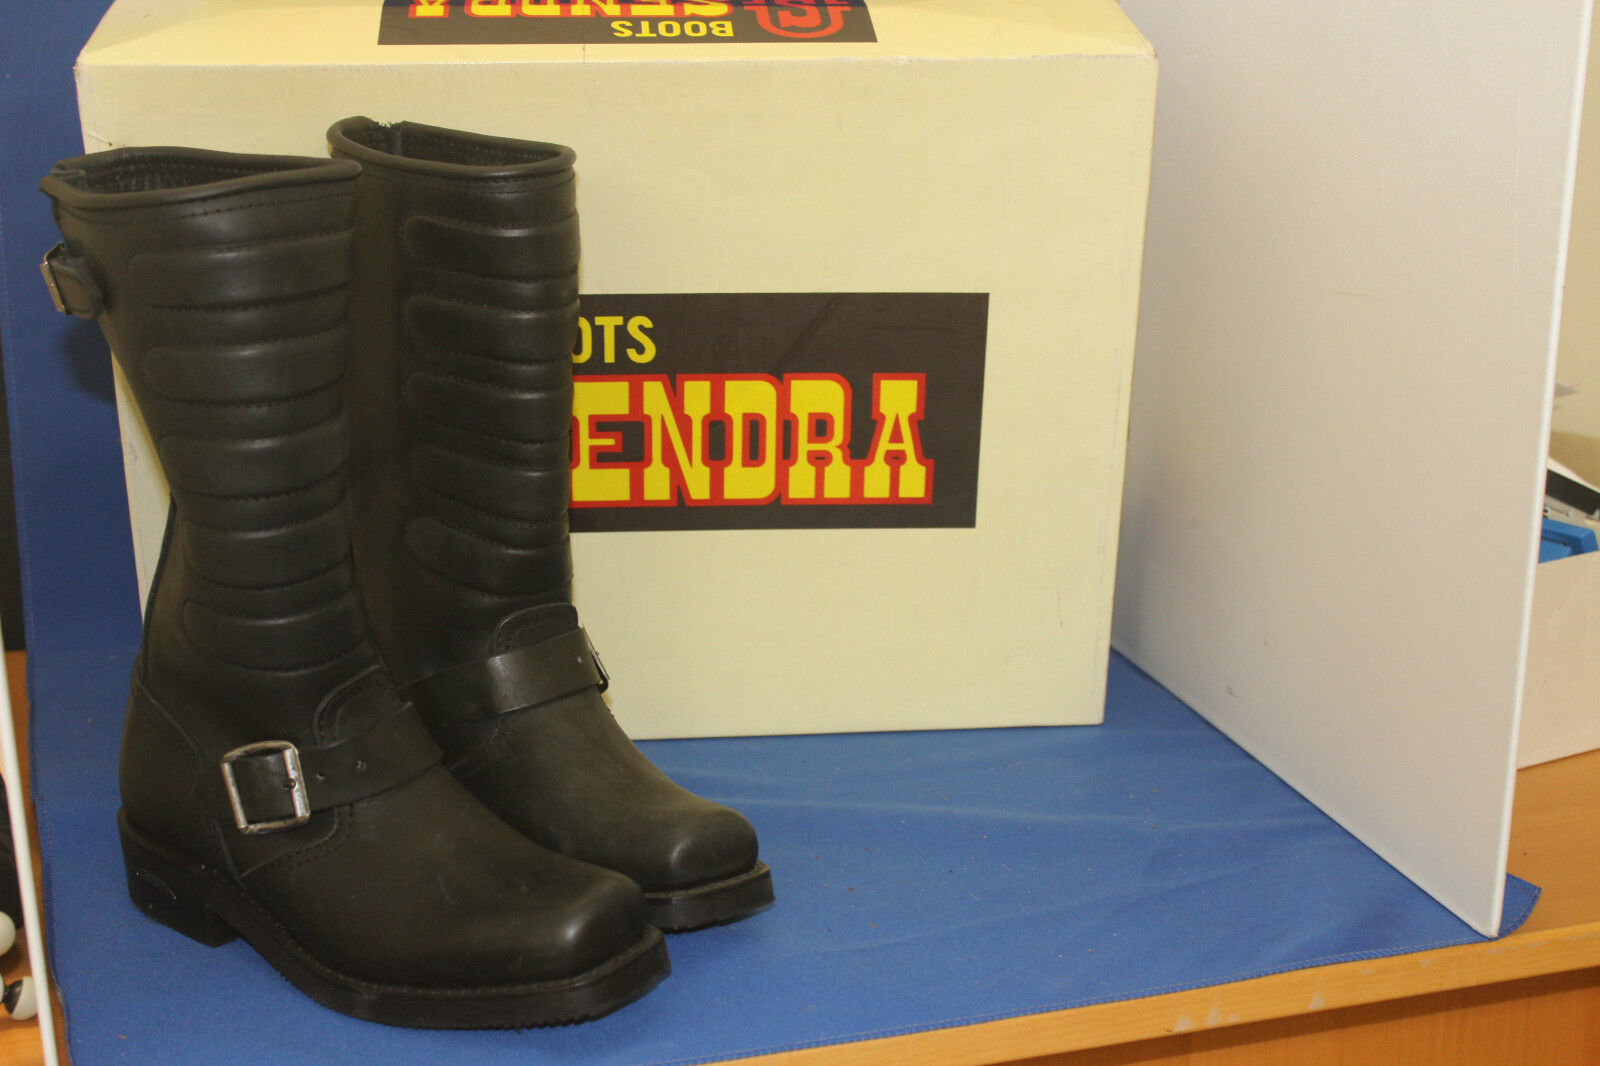 Sendra Boots cowboystiefel westernstiefel Biker neu leder handmade  gr. 38 black